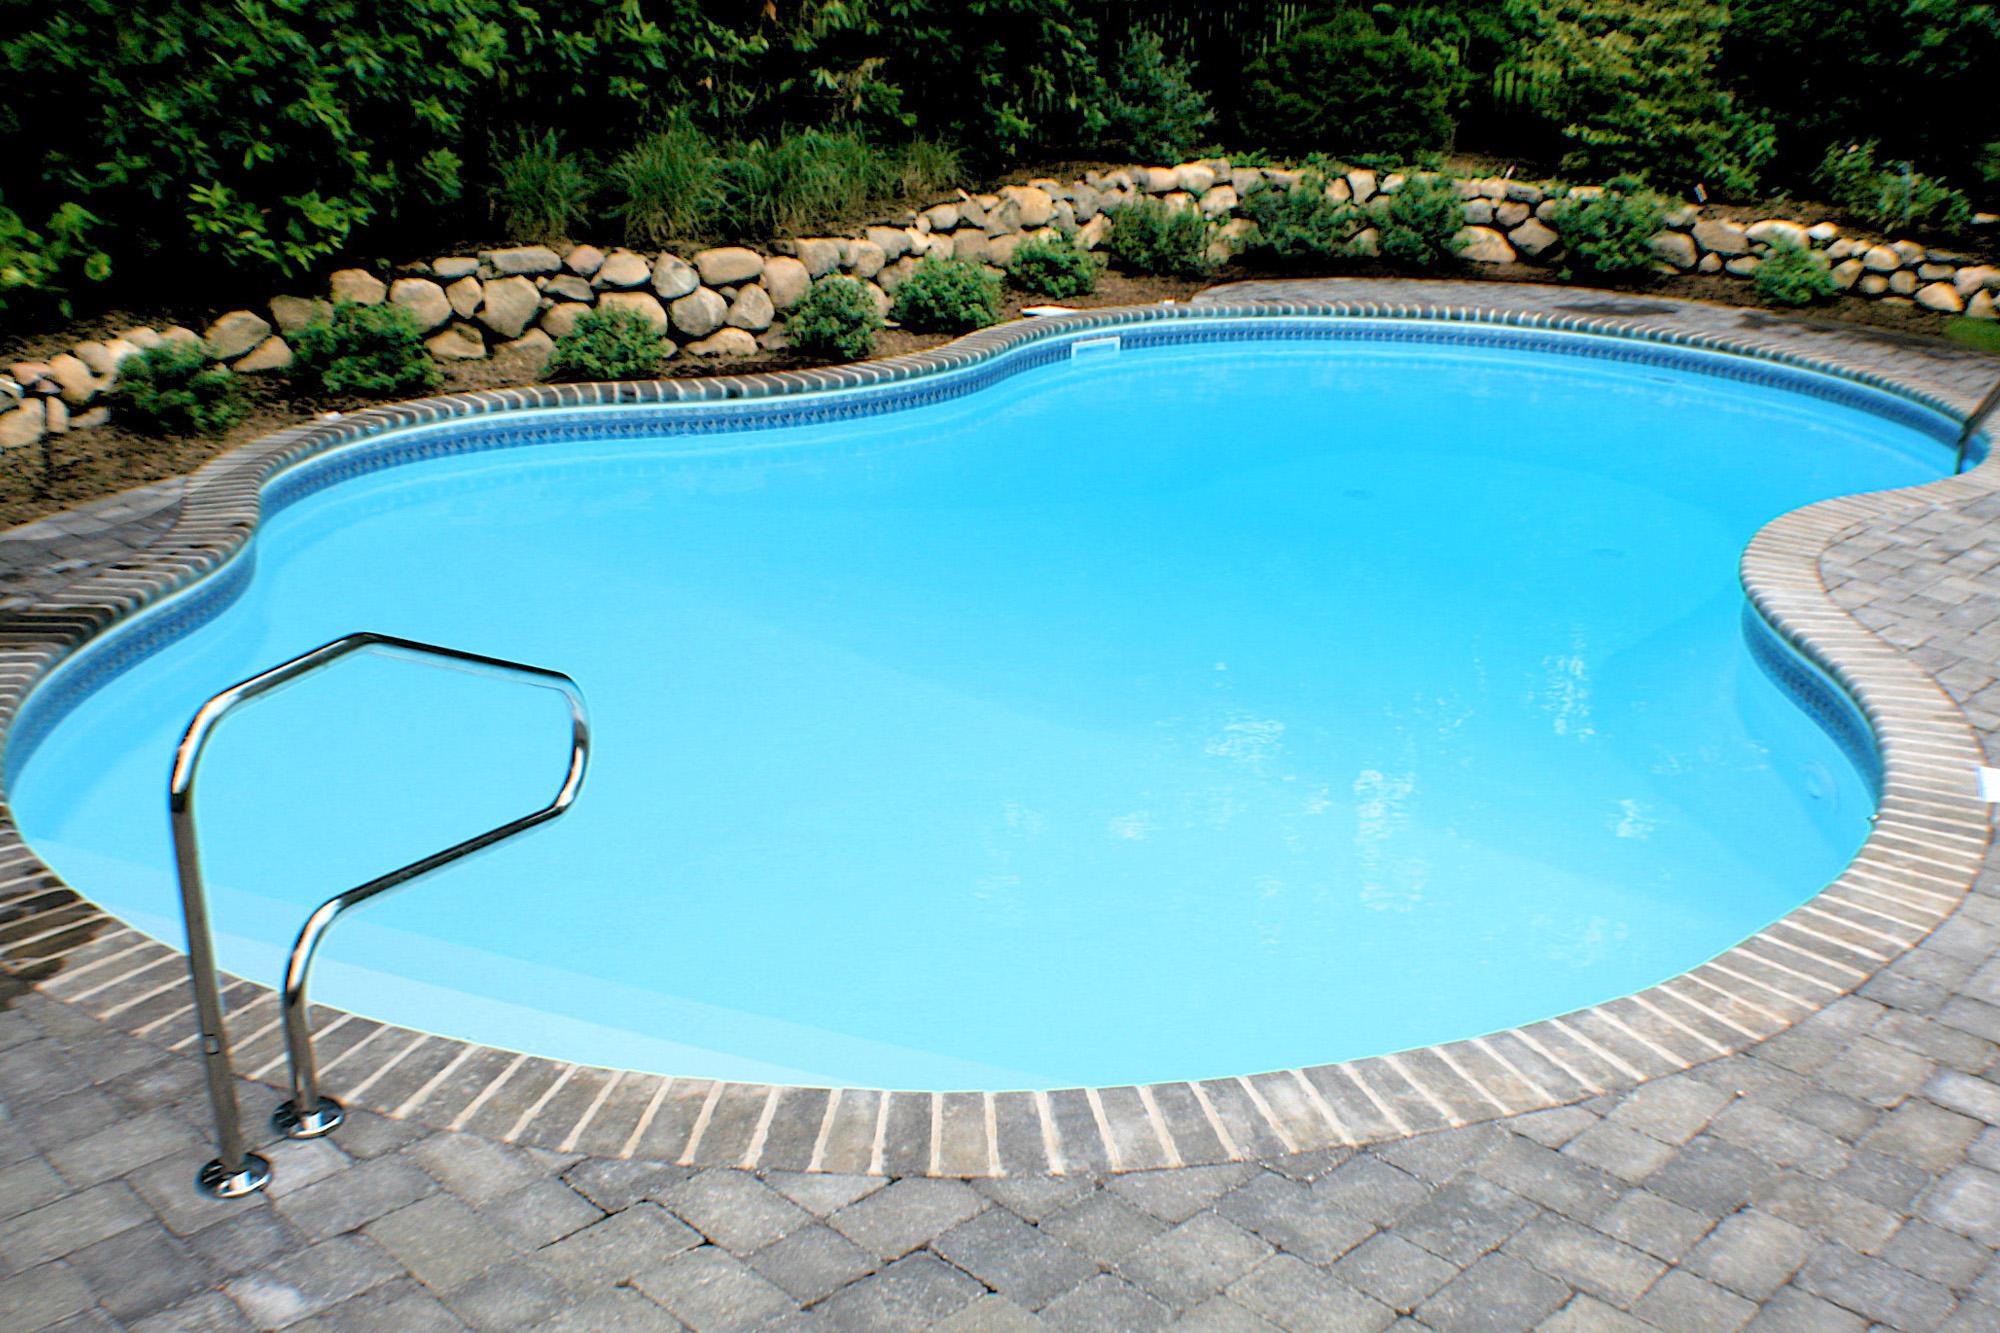 Masterson Pools | Inground Swimming Pools